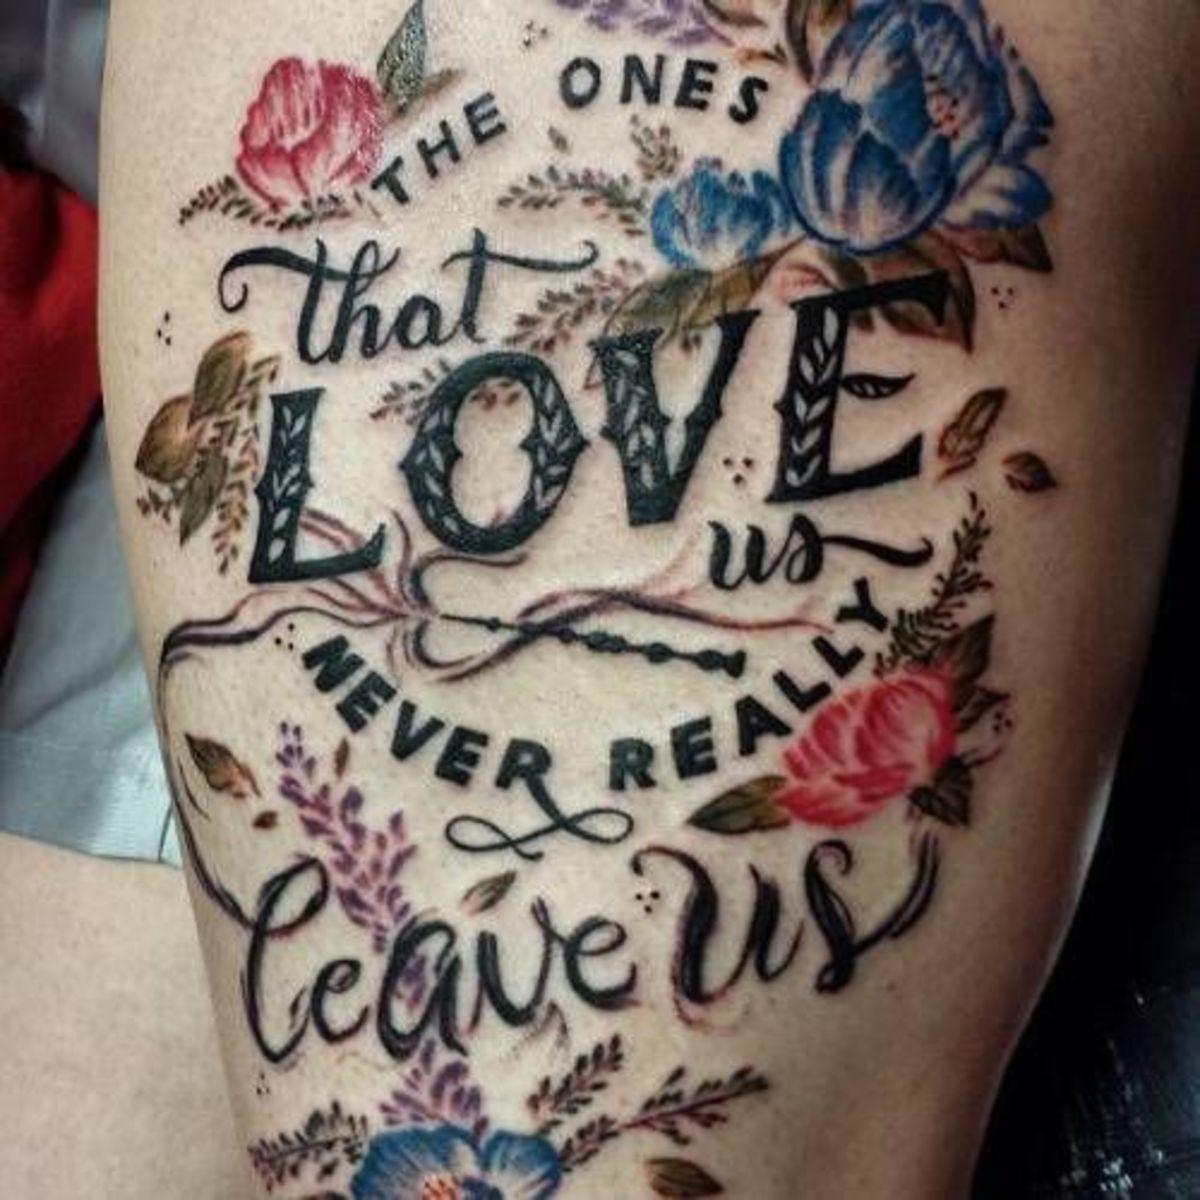 Movie quote tattoo